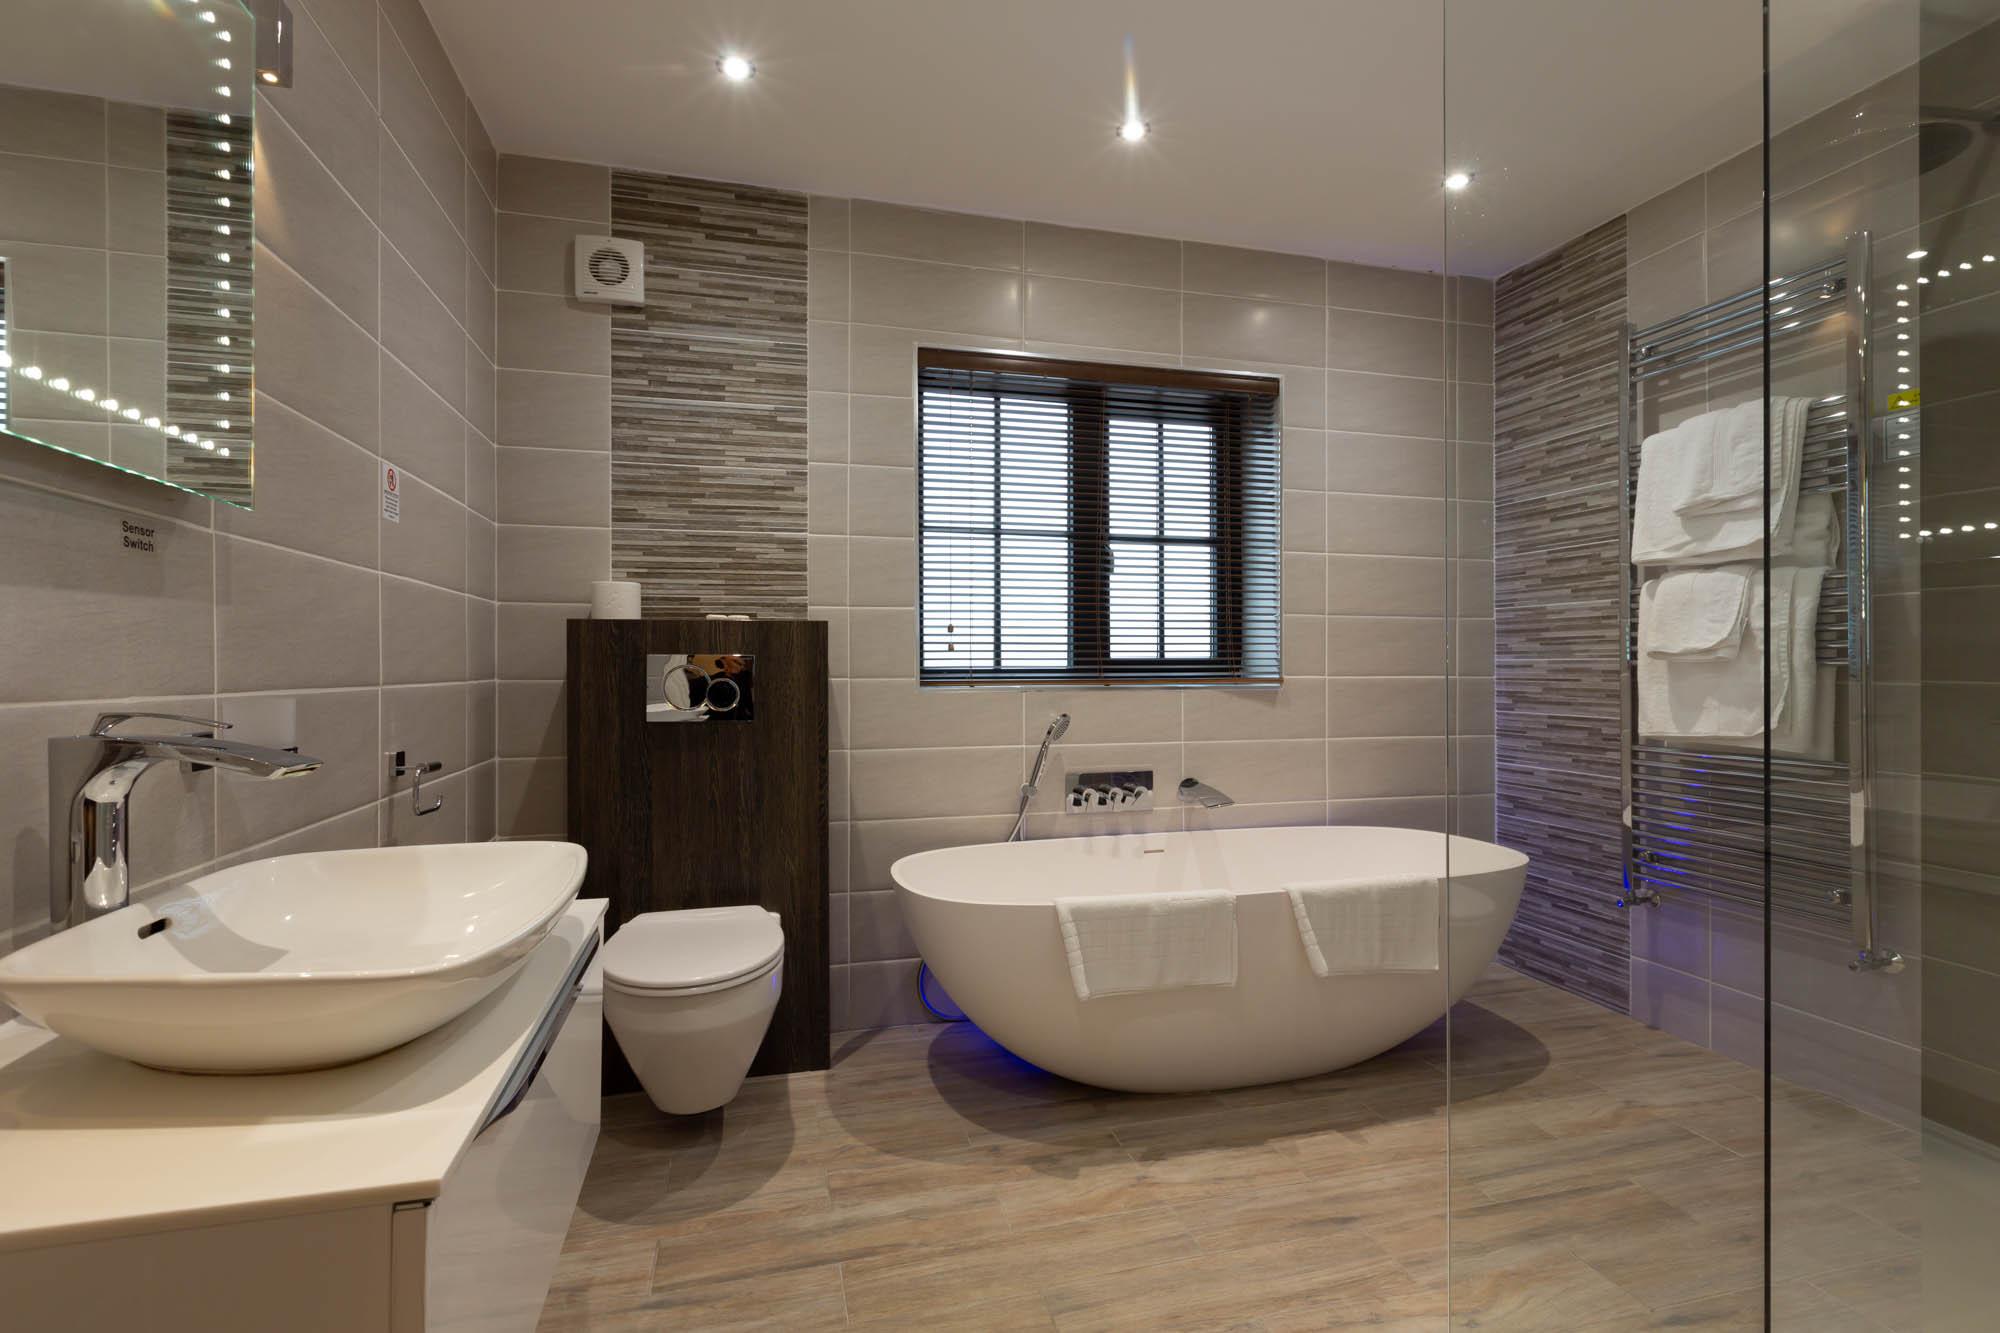 Executive Suite Bathroom with Freestanding Bath